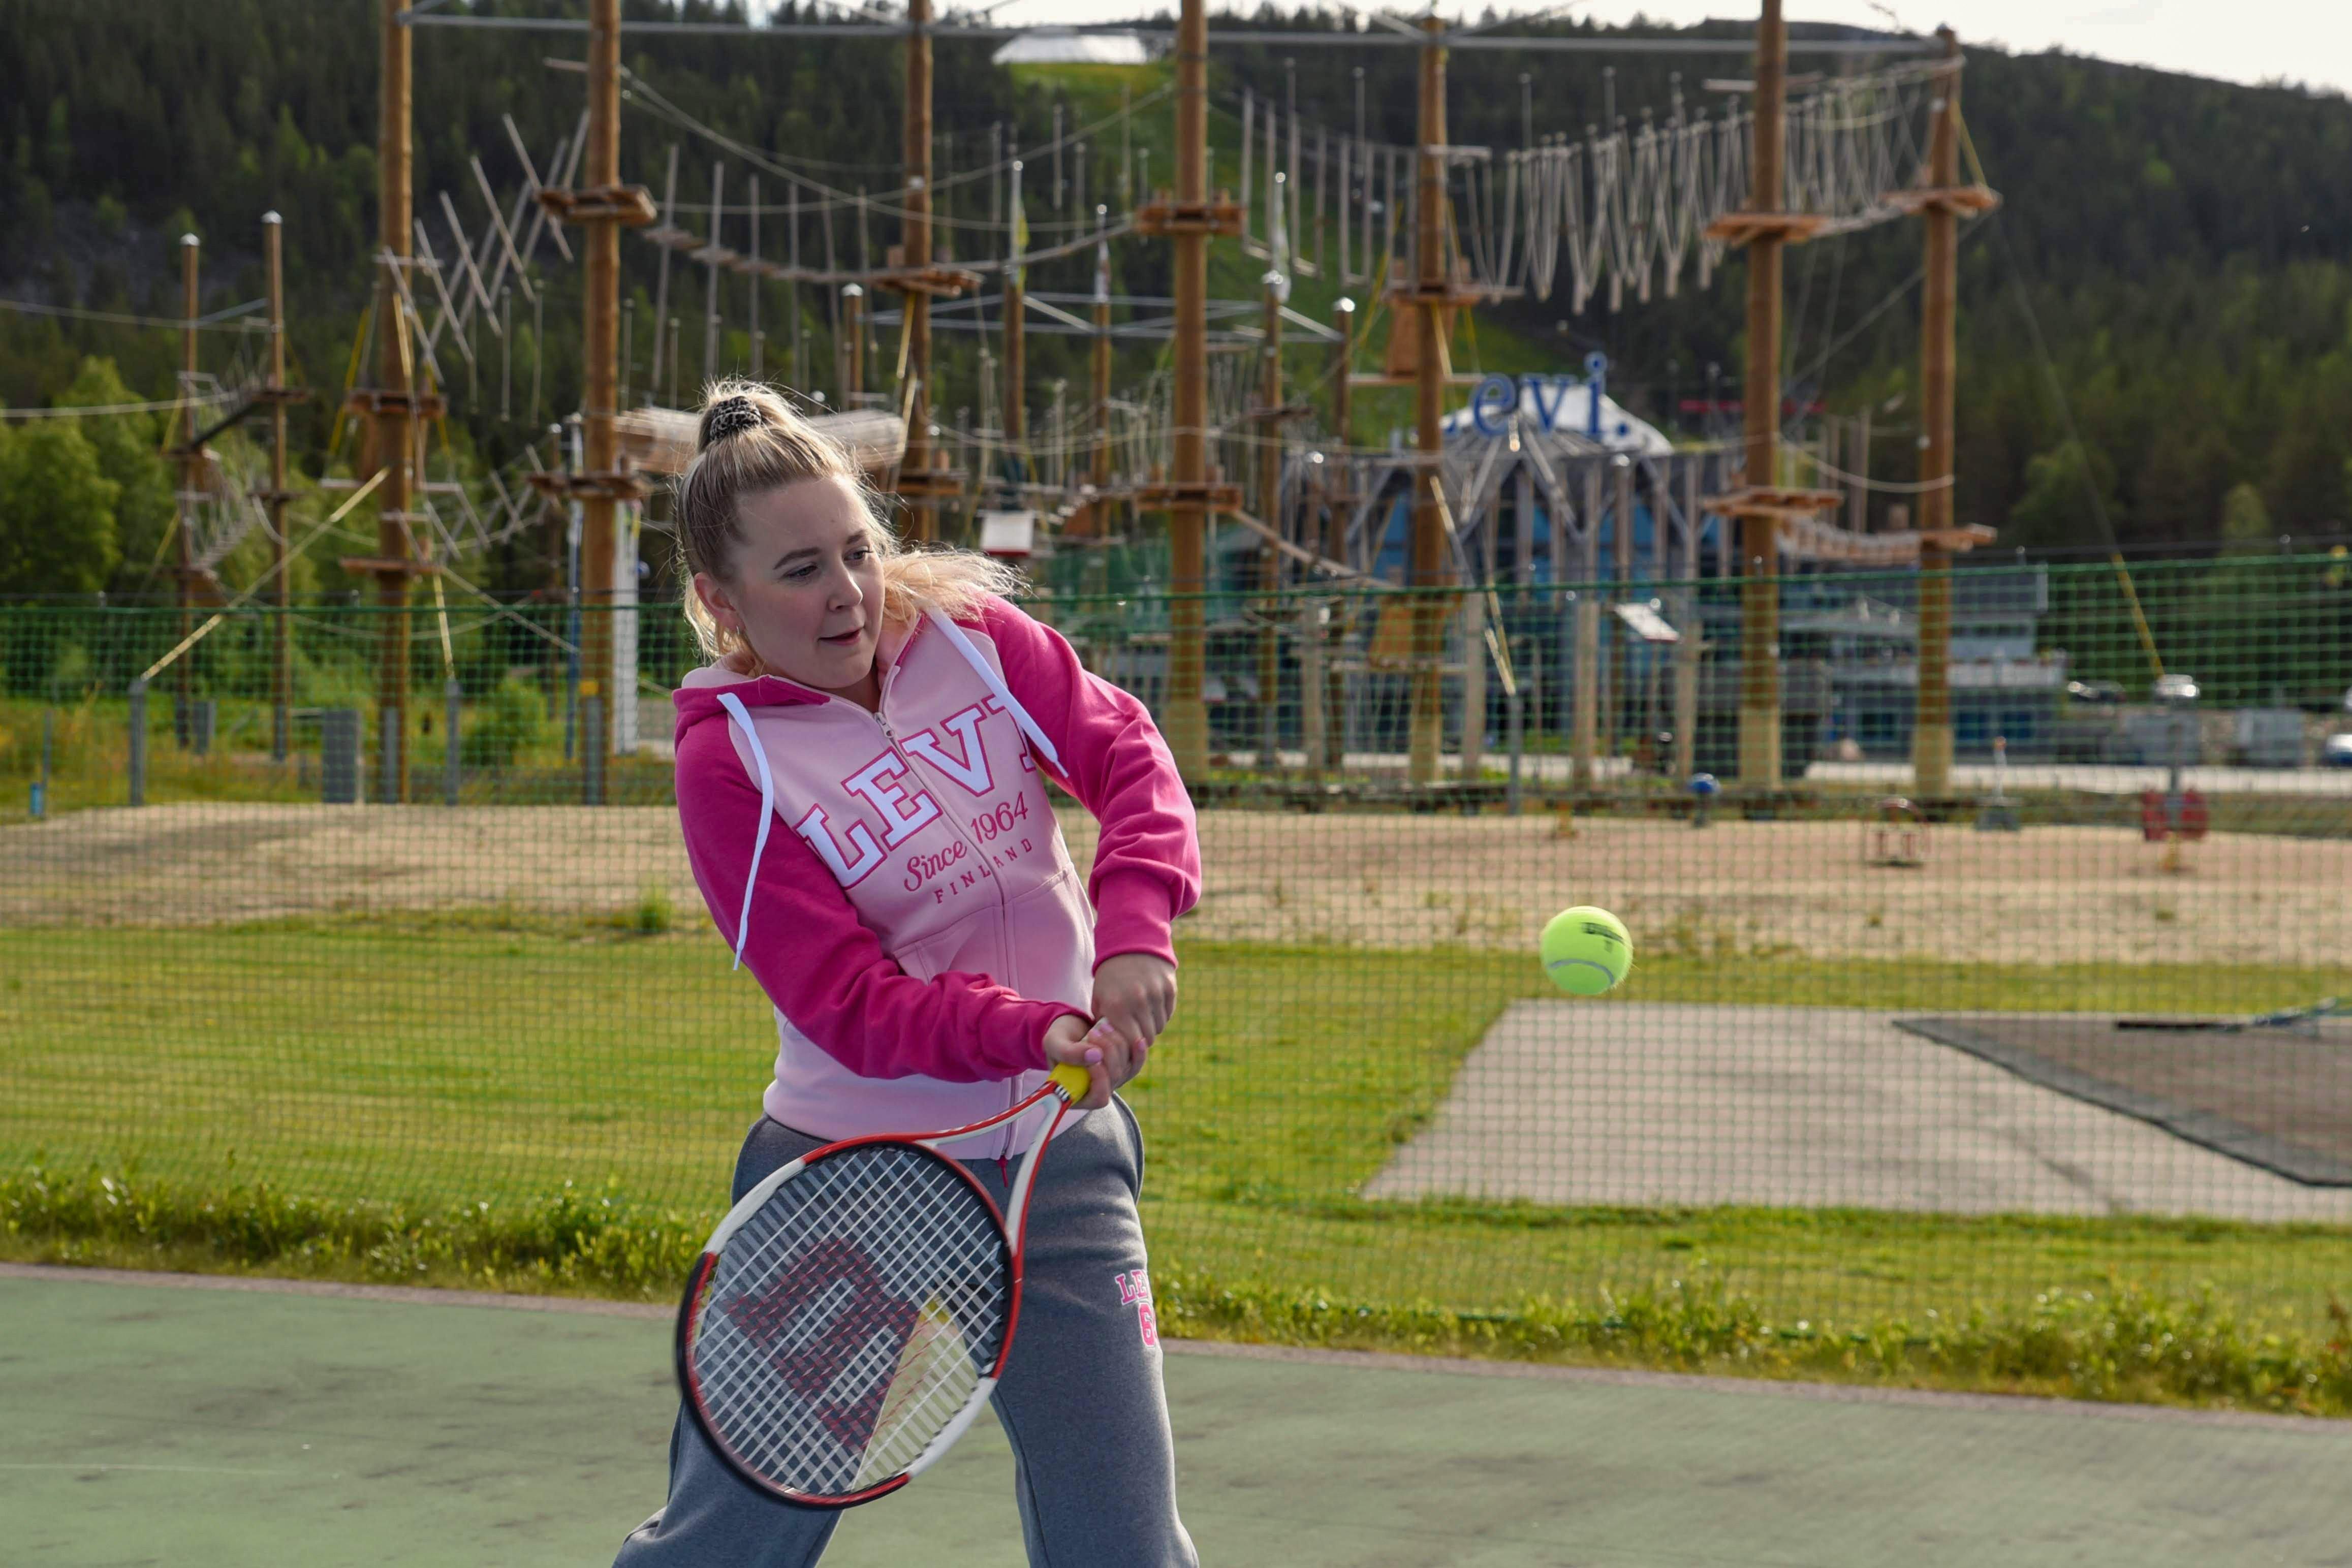 LeviSkiResort-Summer-tennis©ArcticAngle